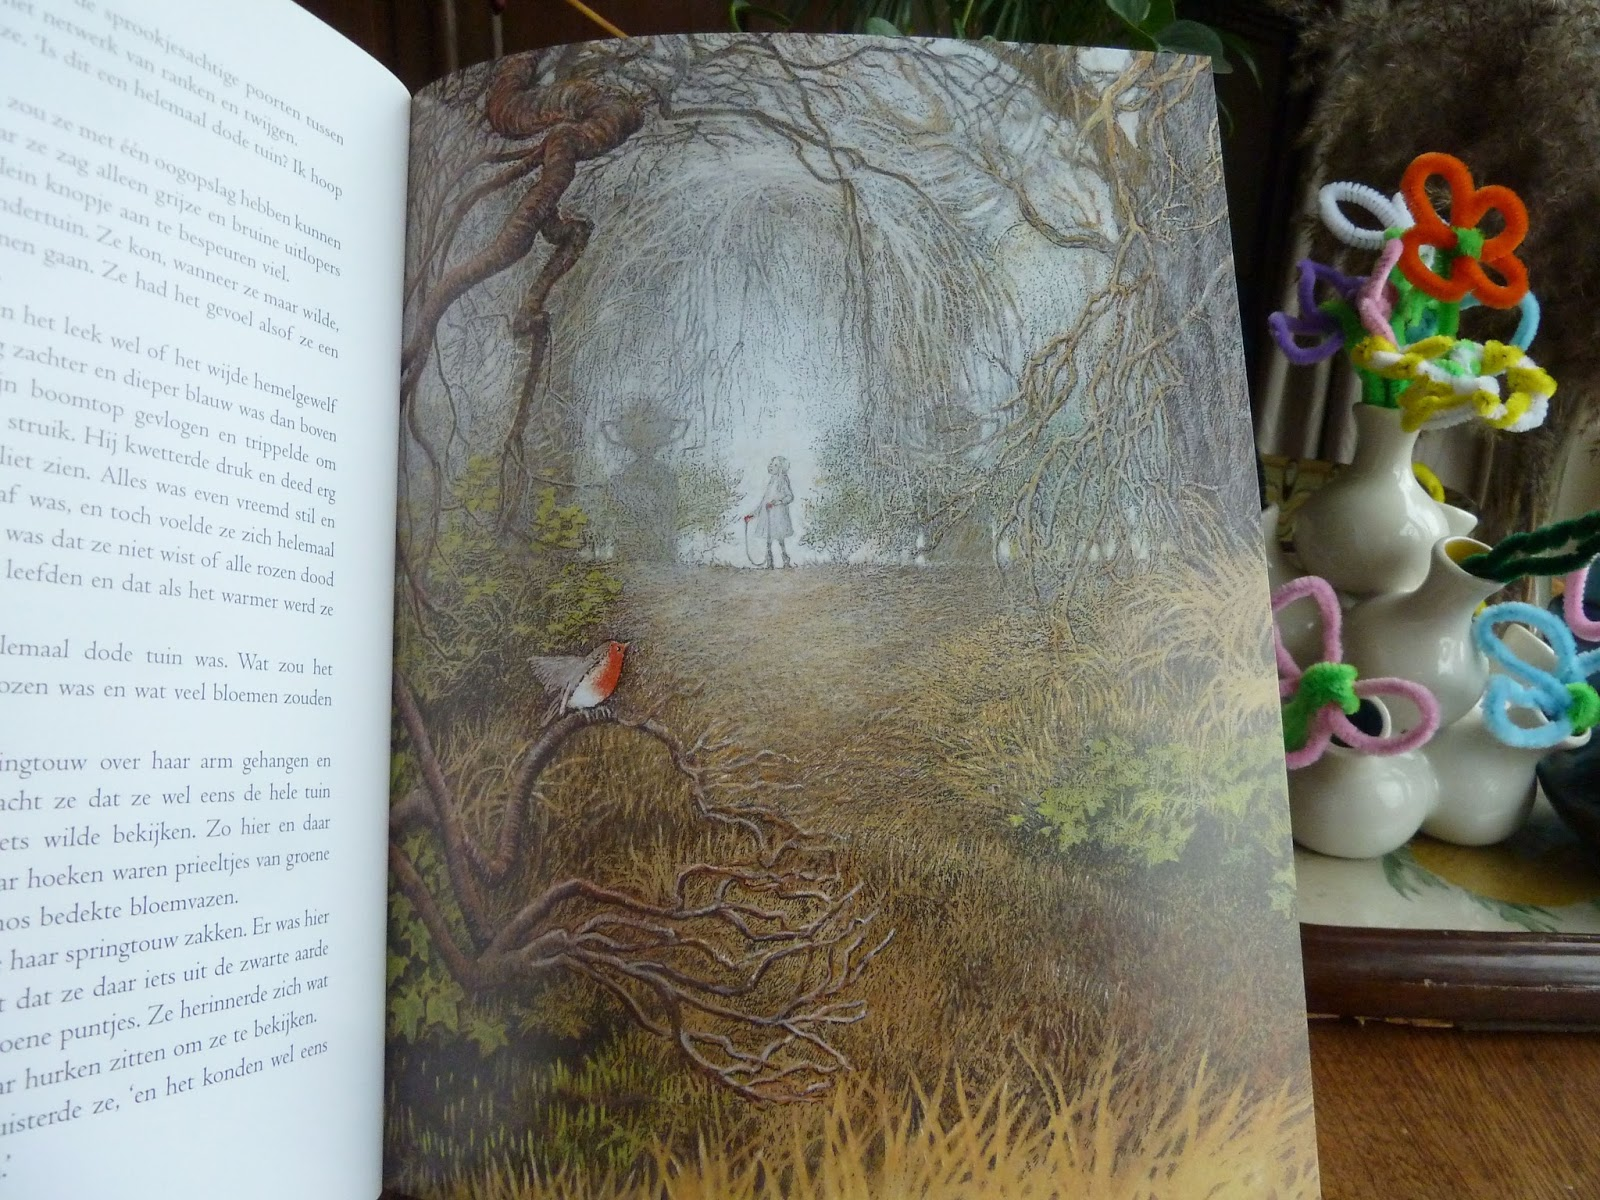 Anita 39 s dagboek de geheime tuin frances hodgson burnett for De geheime tuin boek